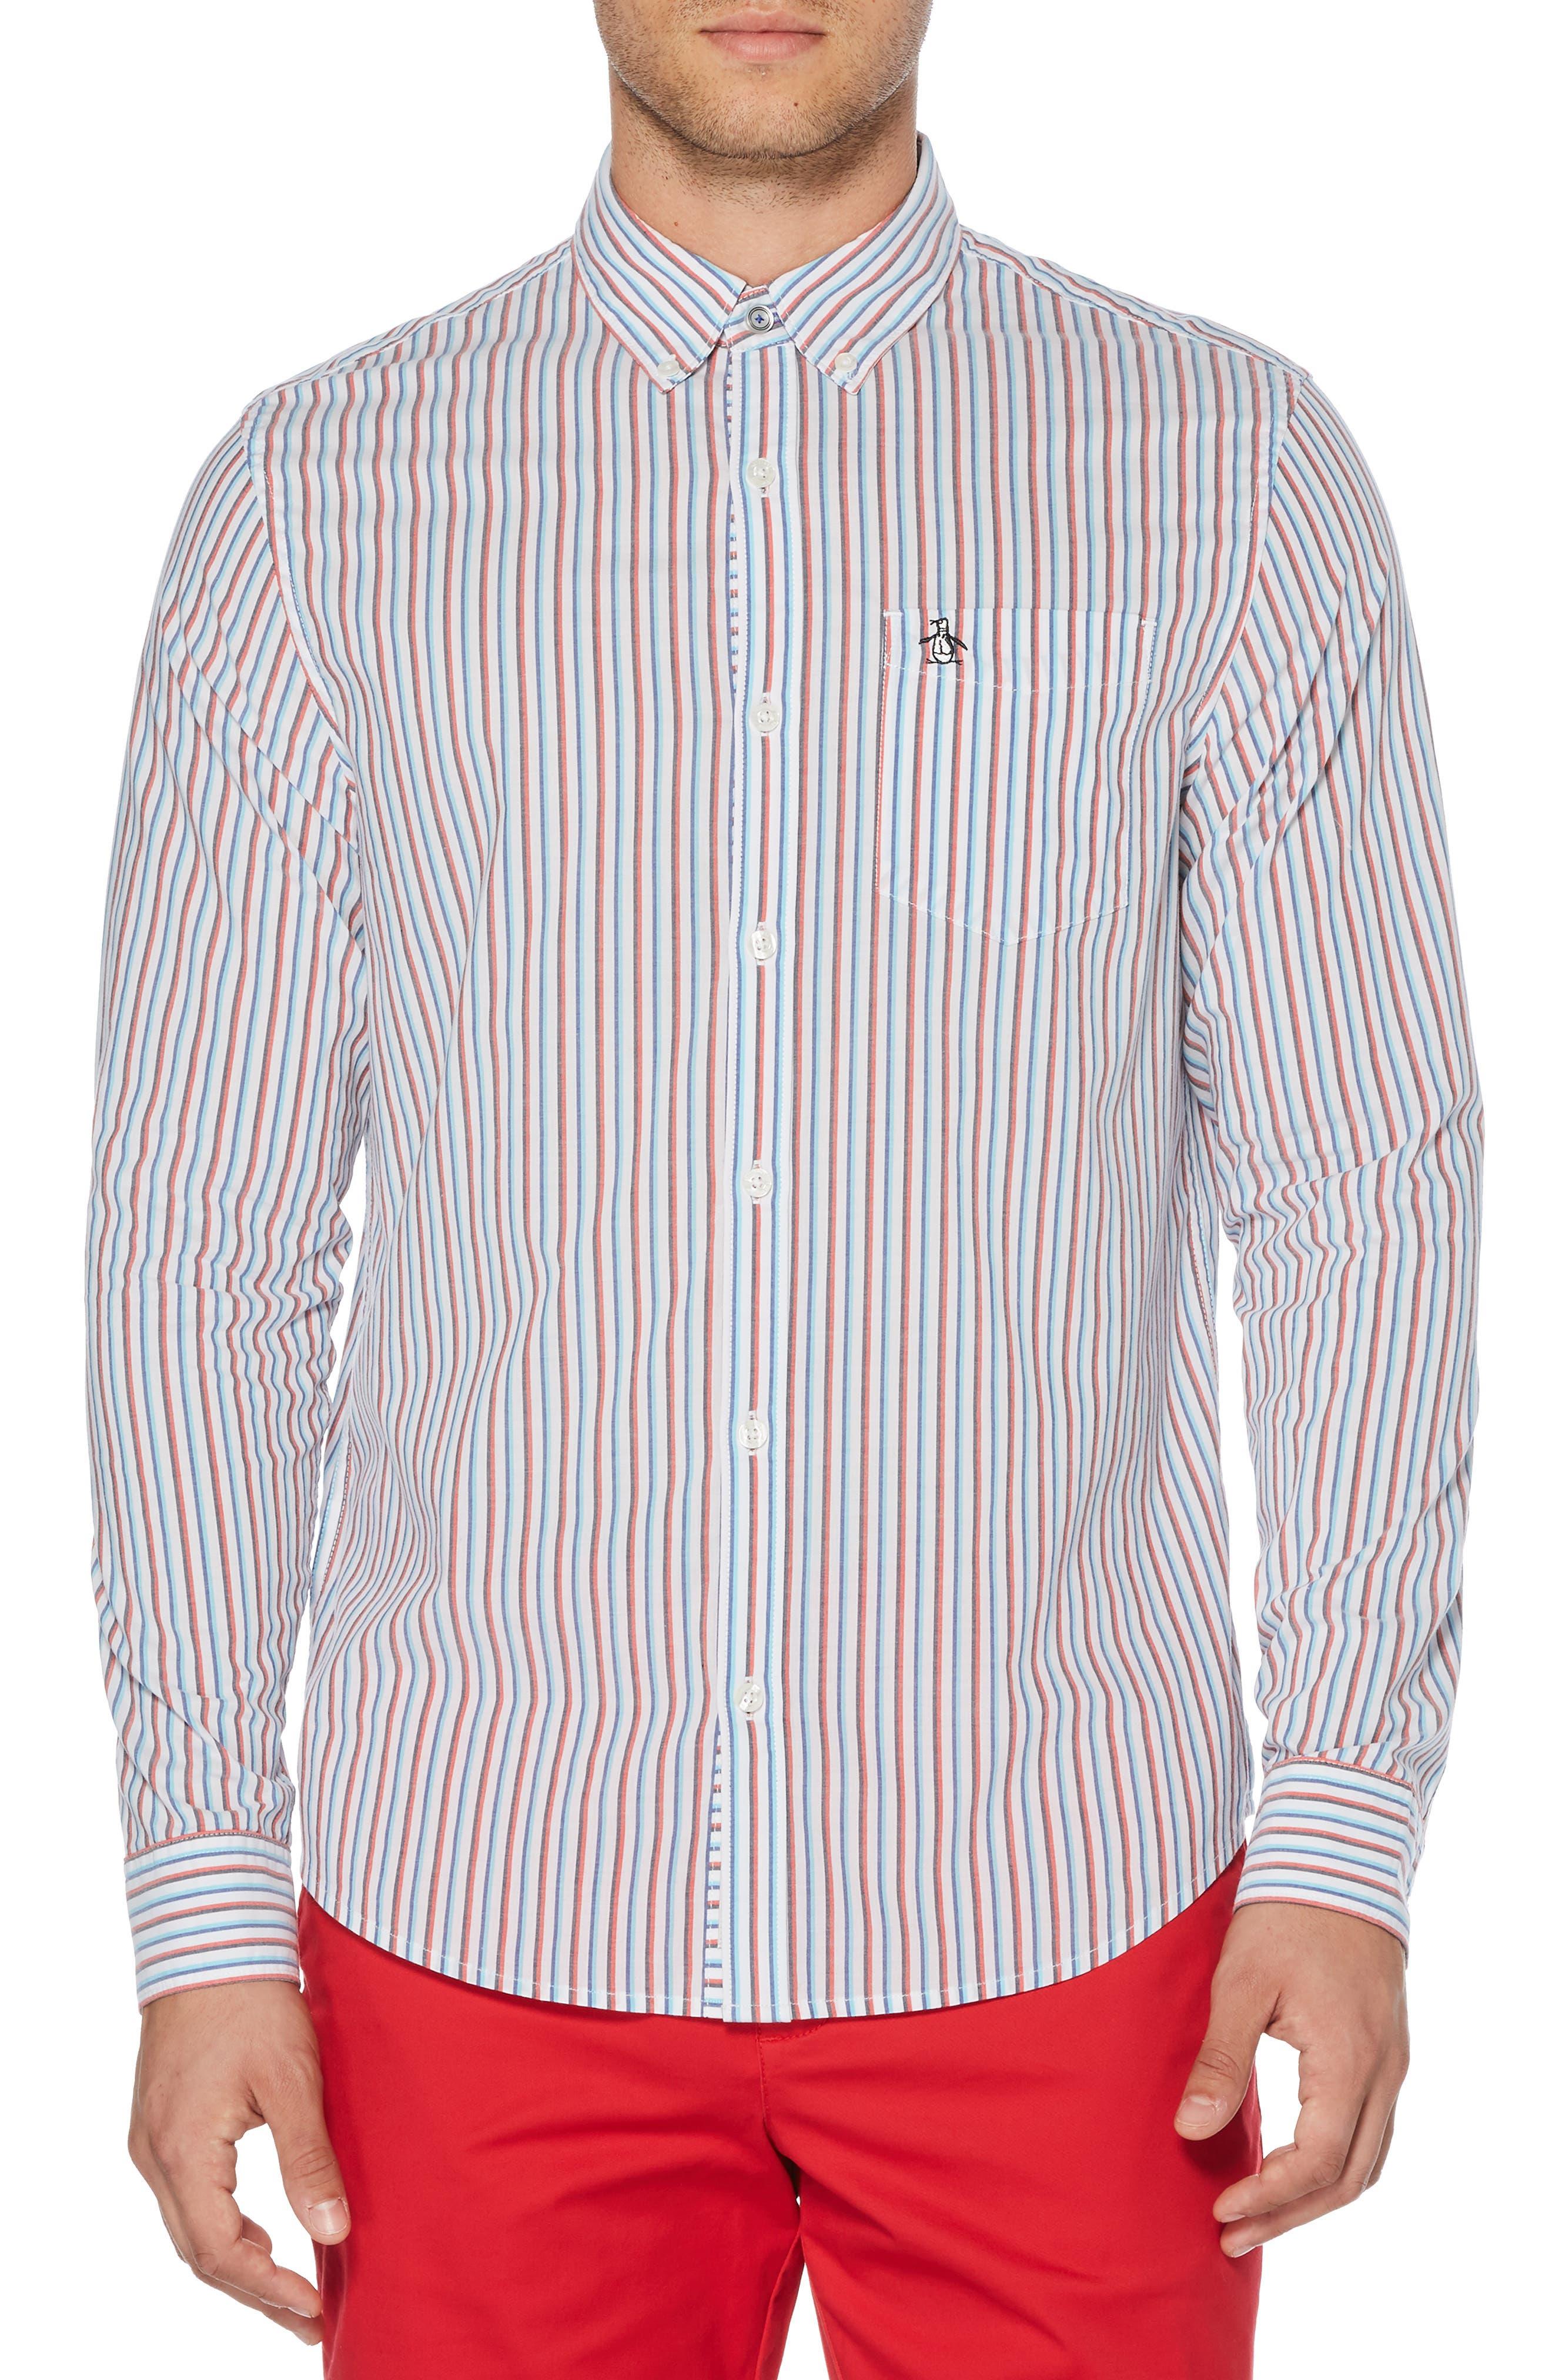 ORIGINAL PENGUIN, Hairline Stripe Sport Shirt, Main thumbnail 1, color, BRIGHT WHITE